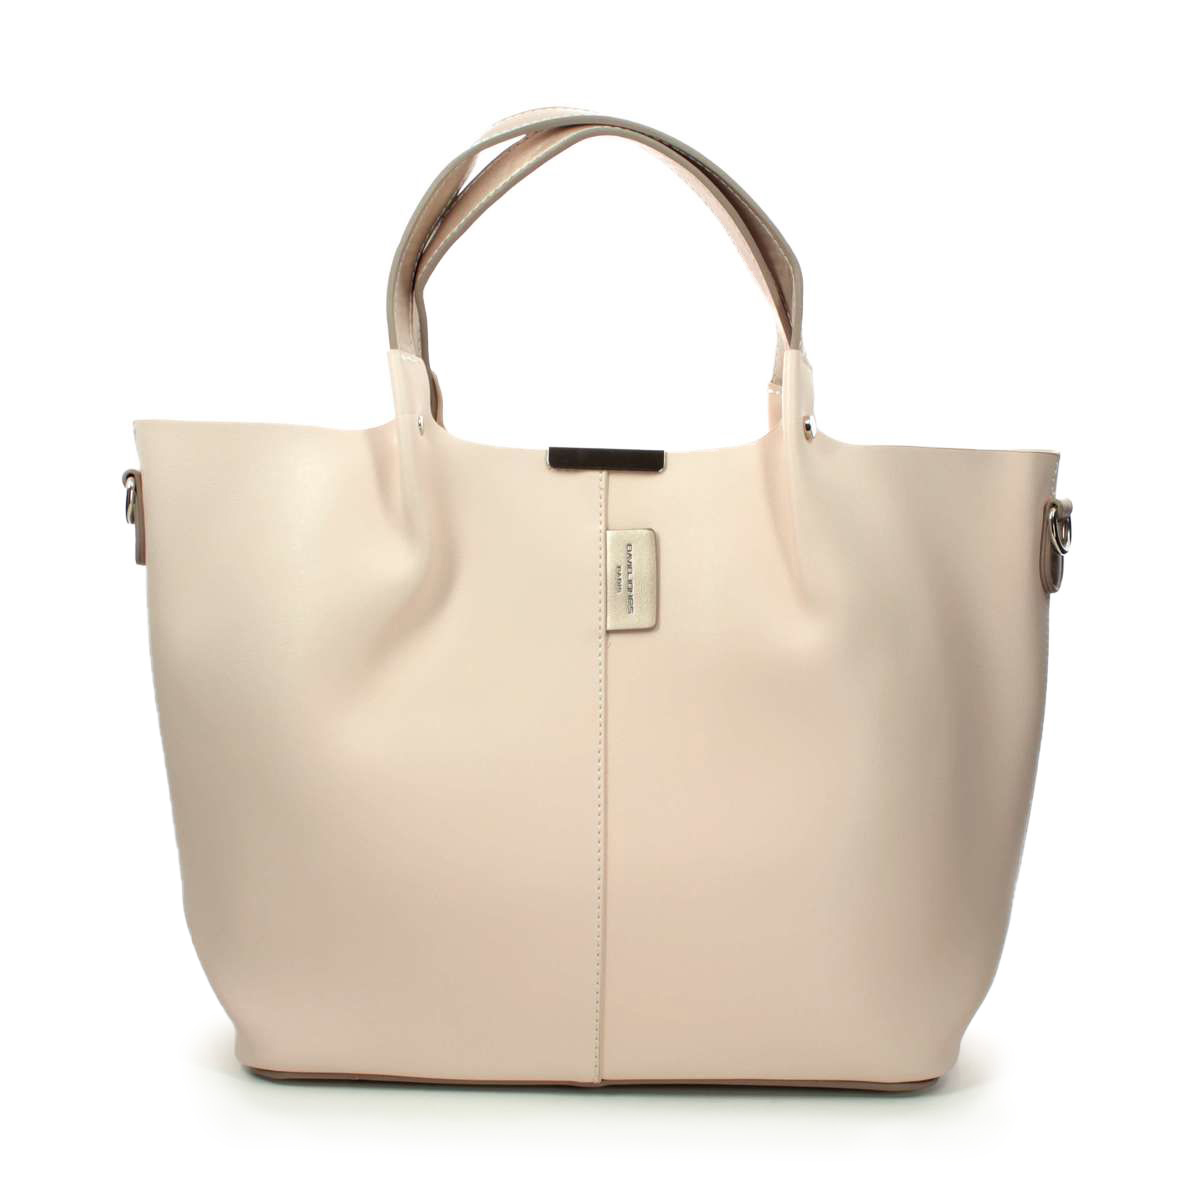 8f6f8fecef4 David Jones Handbag - Natural tan - 5928/10 MELUN GRAB